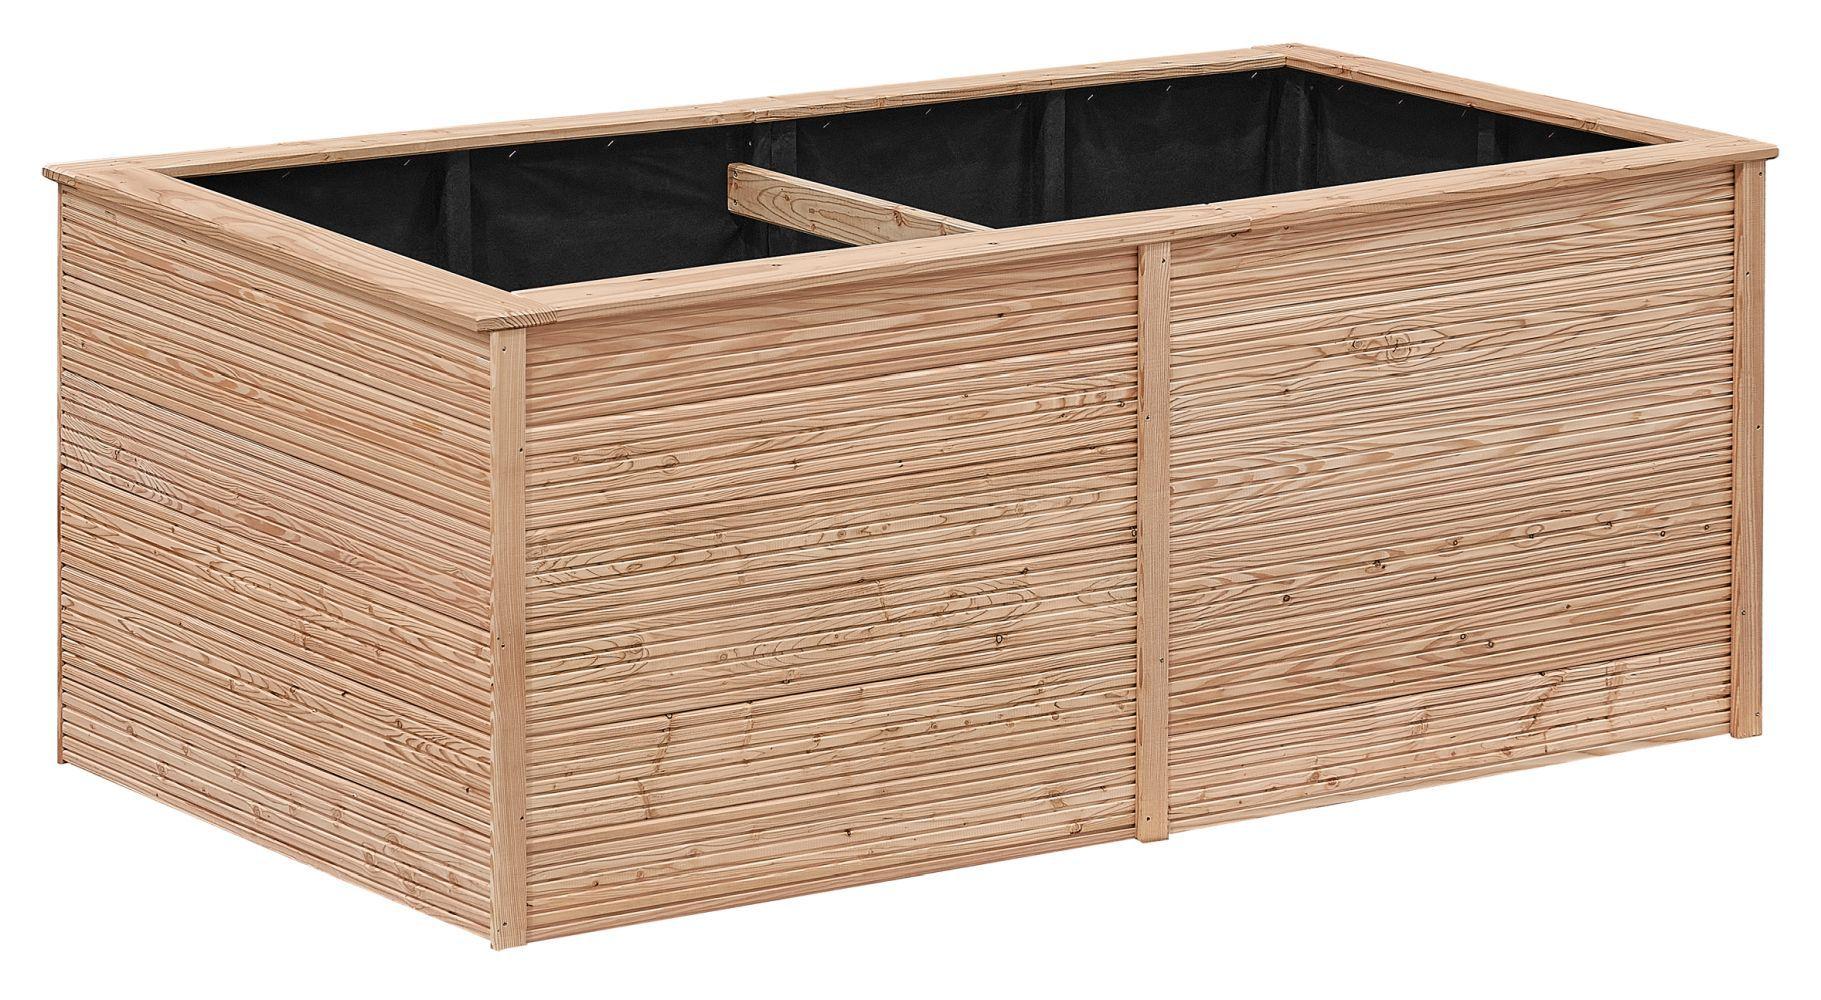 Verhoogd groente bed tuin 01 - gemaakt van Larikshout, FSC® - afmetingen: 206 x 103 x 86 cm (B x D x H)